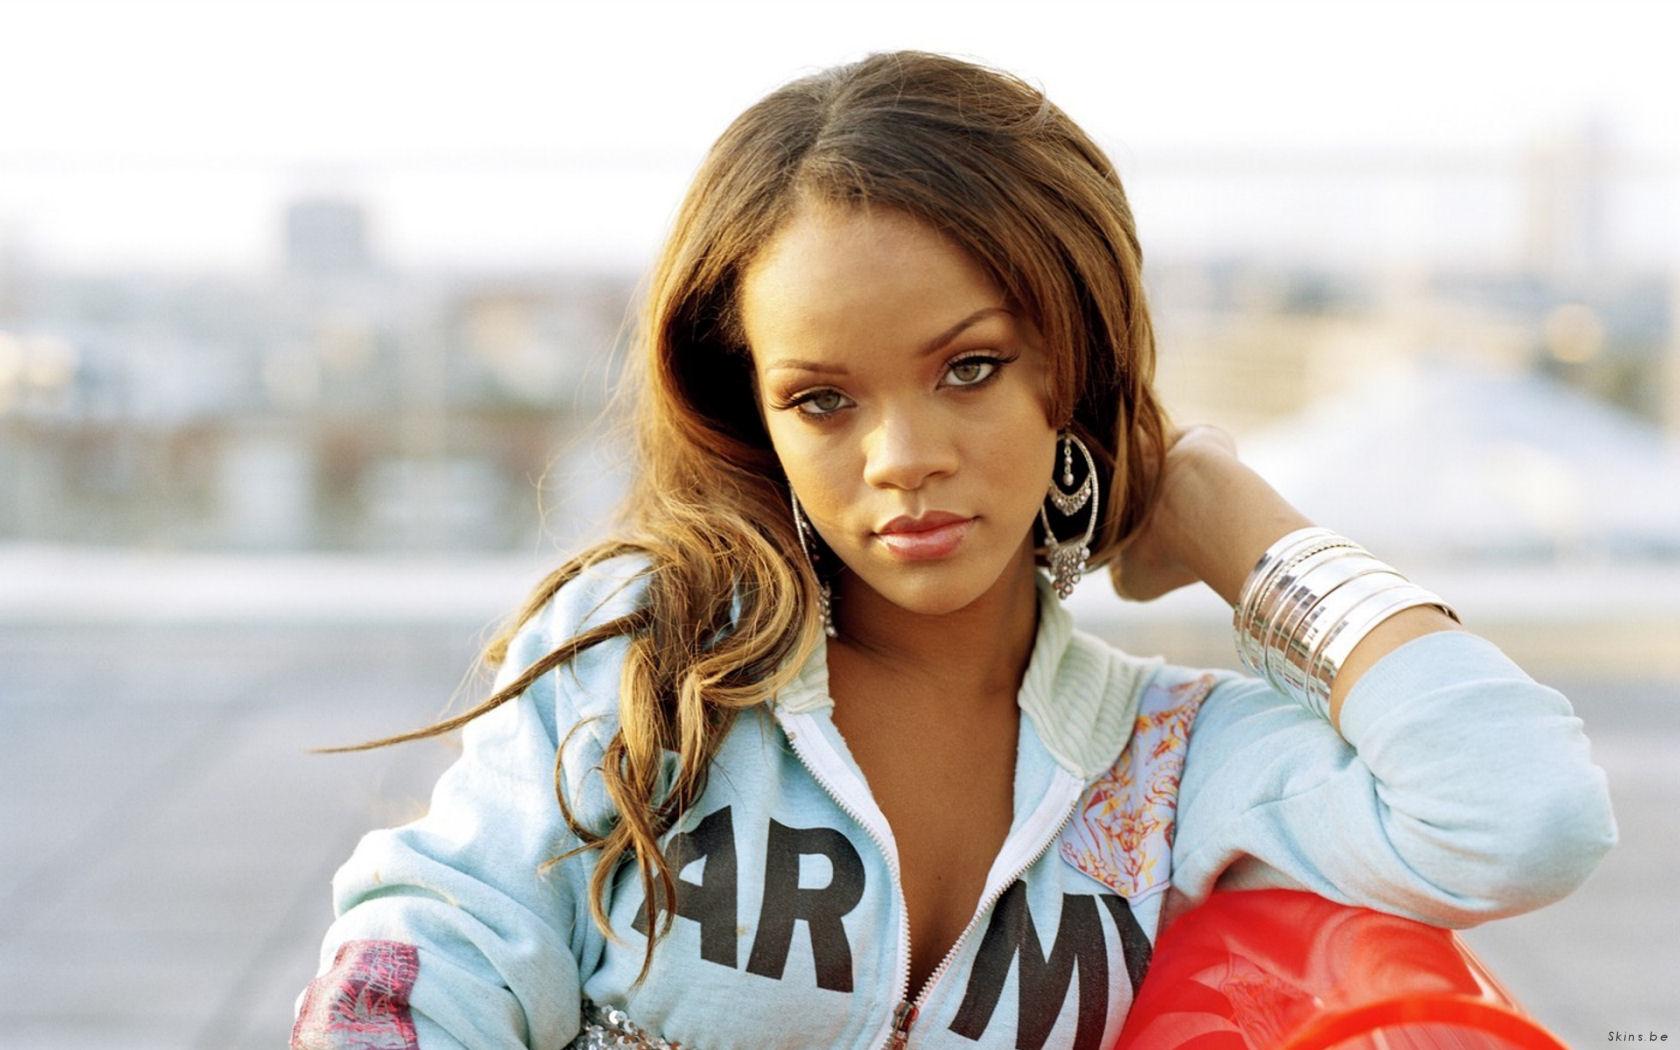 Girl Wallpaper Hd 2018 Fondos De Pantalla De Rihanna Wallpapers